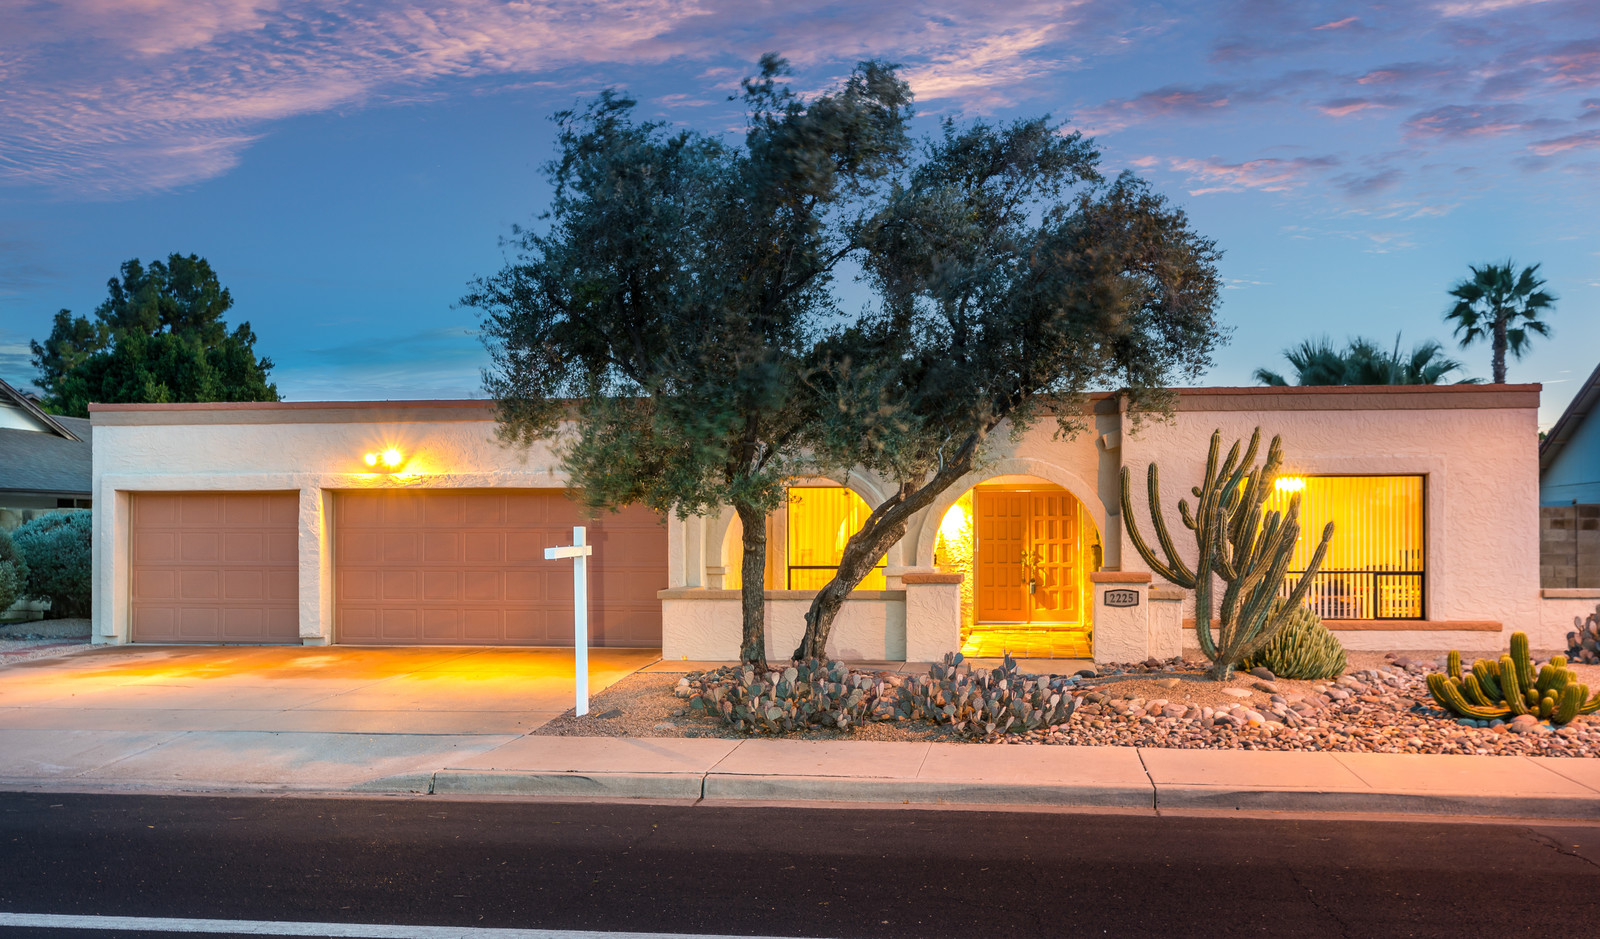 2225 W Keating AVE, Mesa, AZ 85202 | $350,000